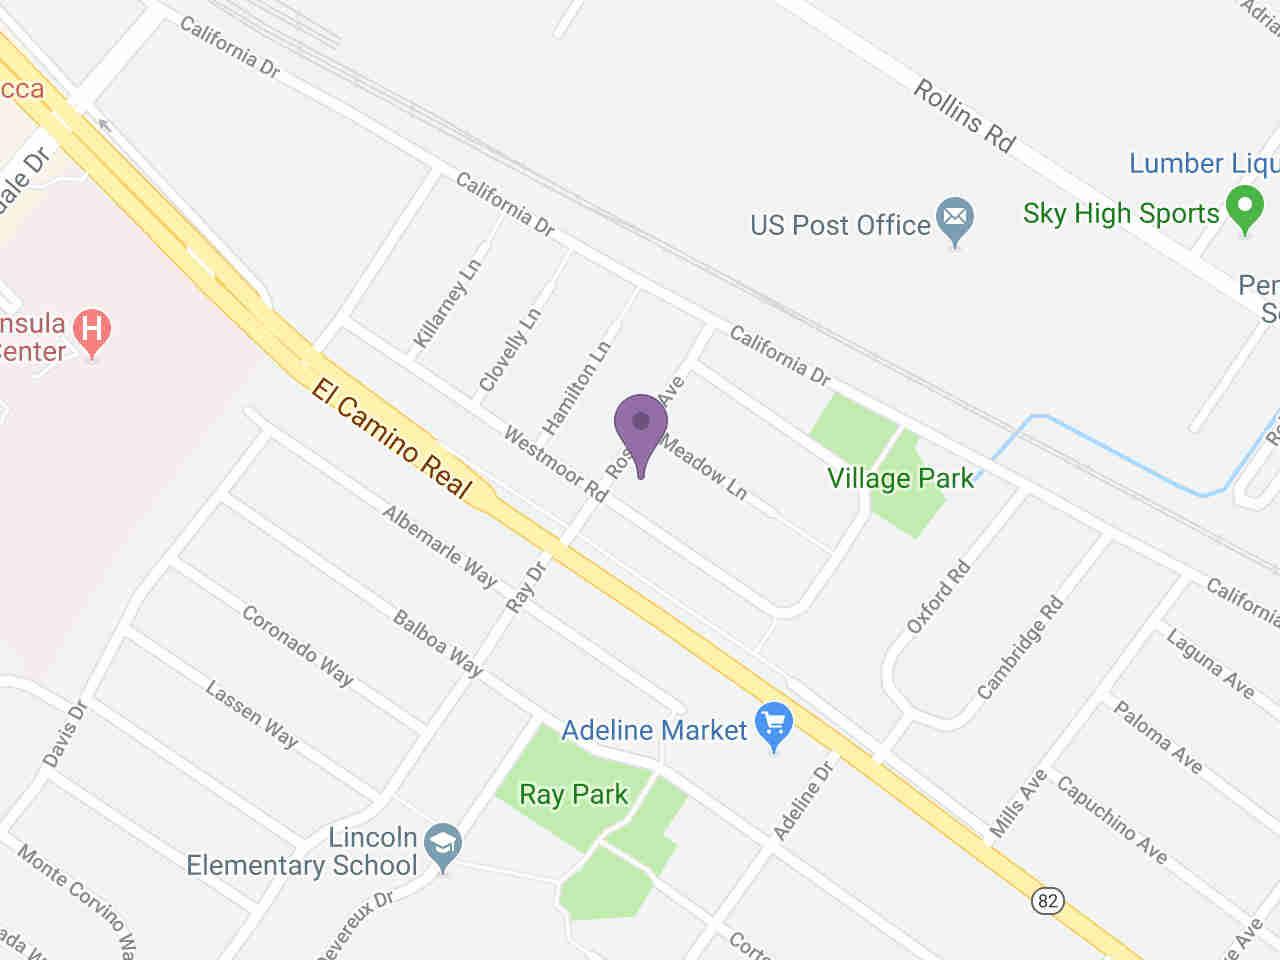 Location:, 1557 Meadow LN Burlingame, CA, 94010